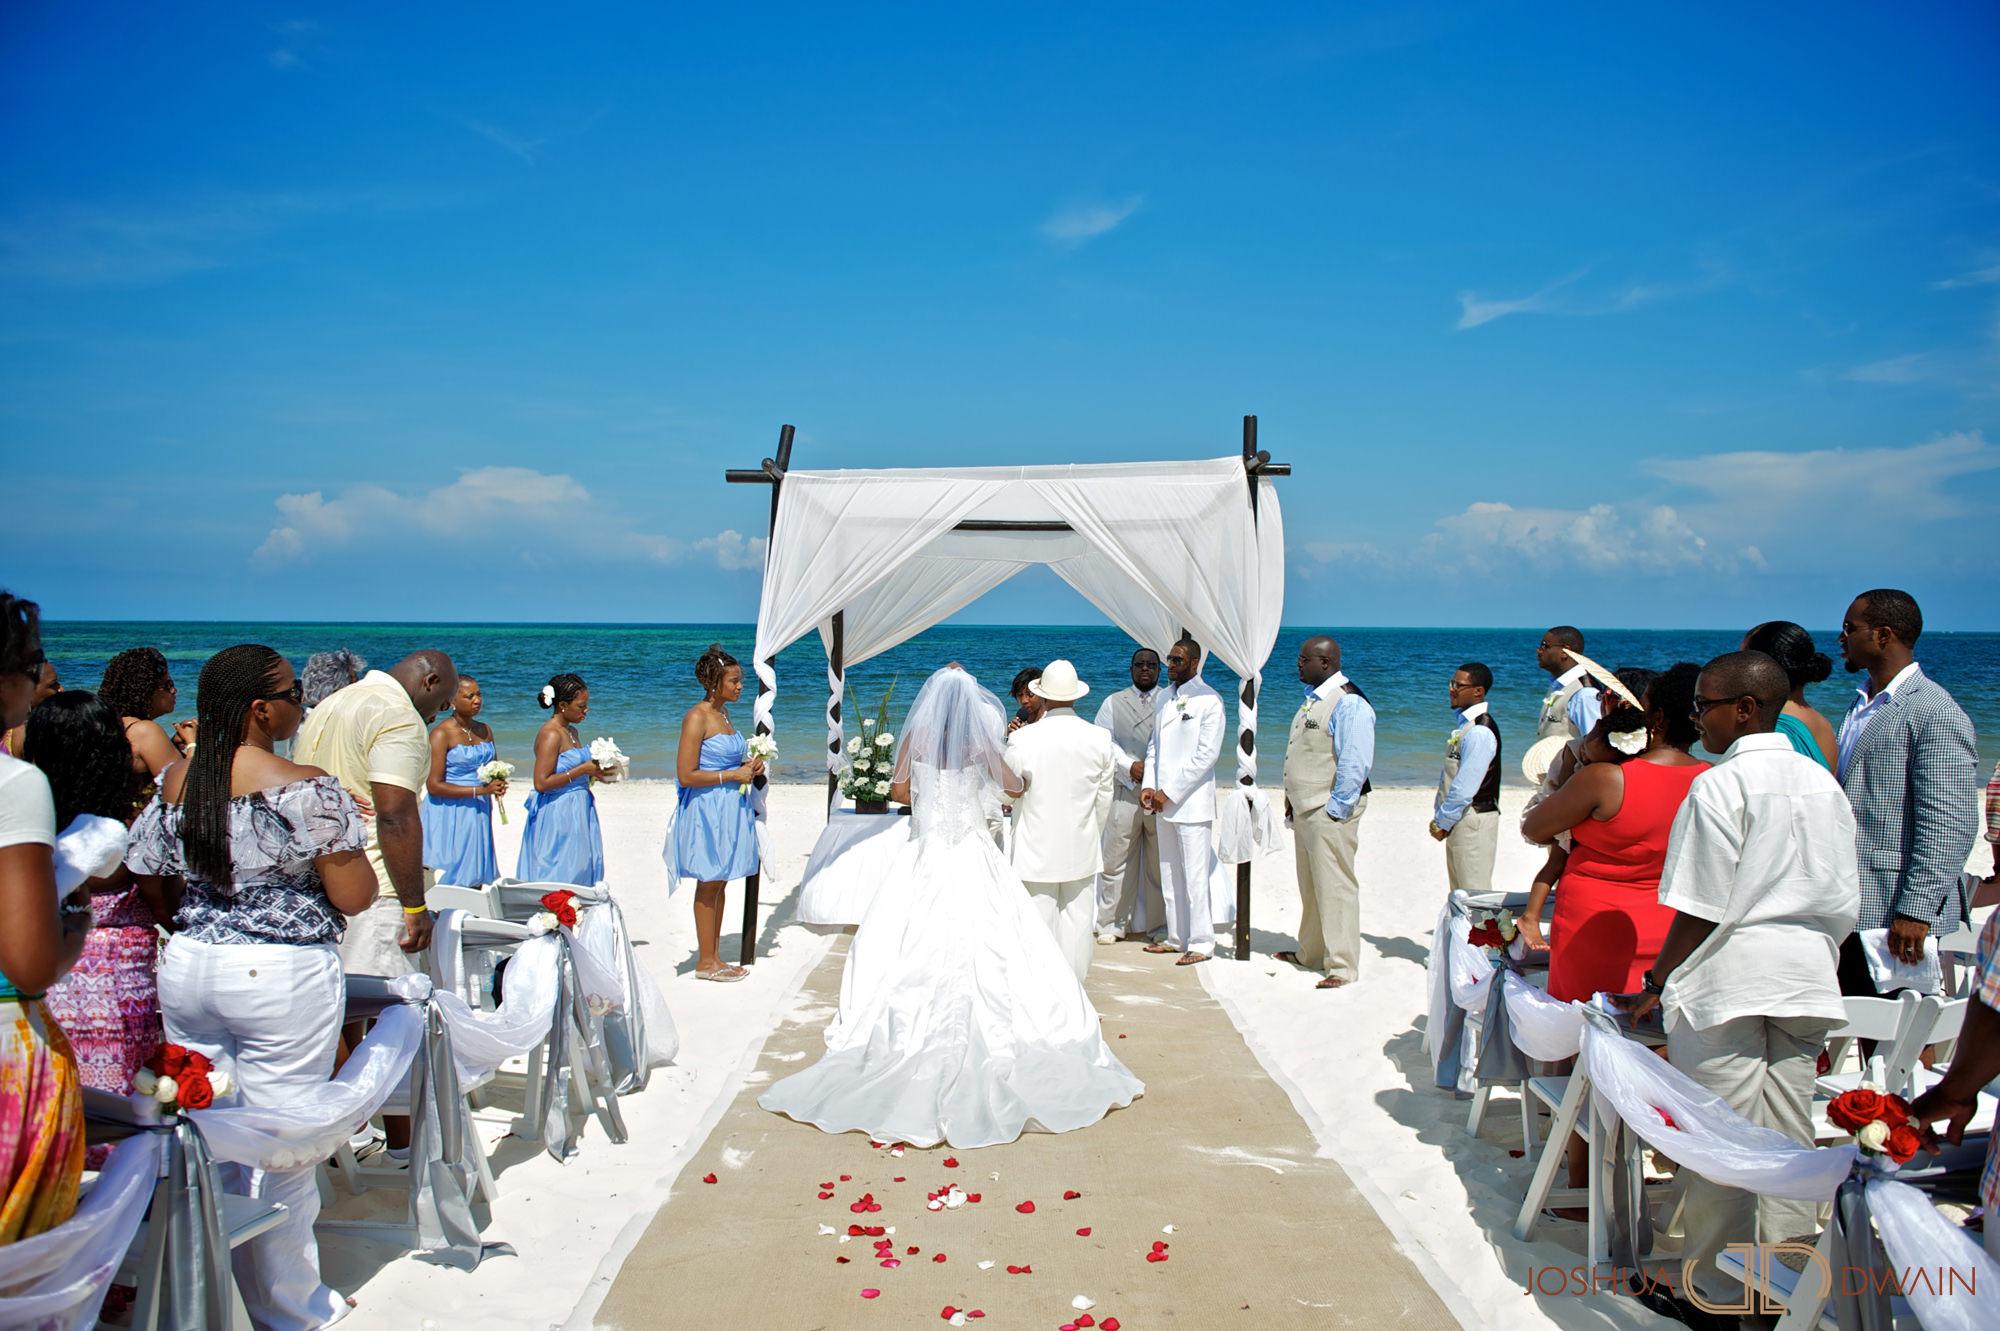 janet-adrian-010-hard-rock-cafe-riveria-maya-mexico-wedding-photographer-joshua-dwain-janet-adrian-010-hard-rock-cafe-riveria-maya-wedding-photographer-joshua-dwain-2011-07-22_ja_243